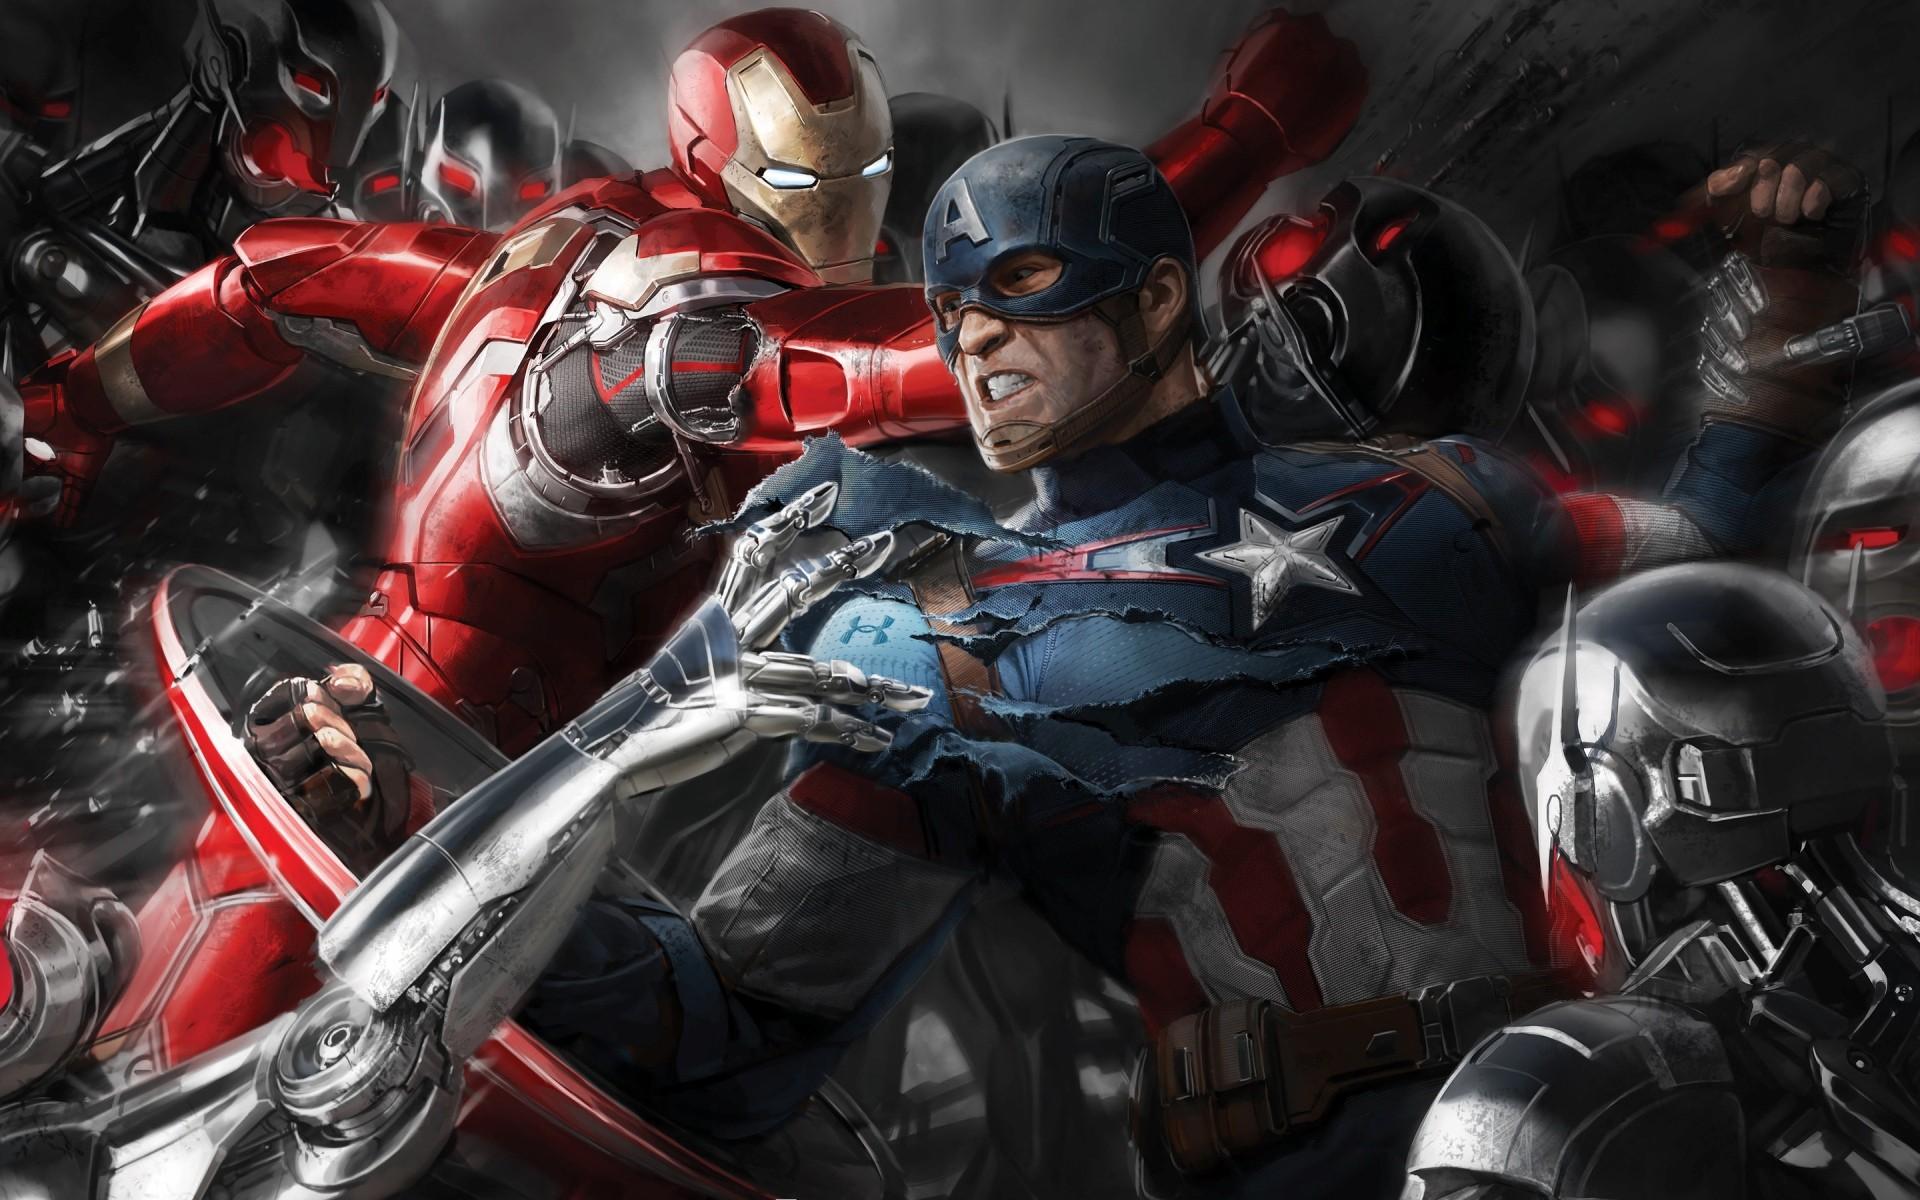 General 1920x1200 Iron Man Captain America The Avengers Avengers: Age of Ultron Marvel Comics comics